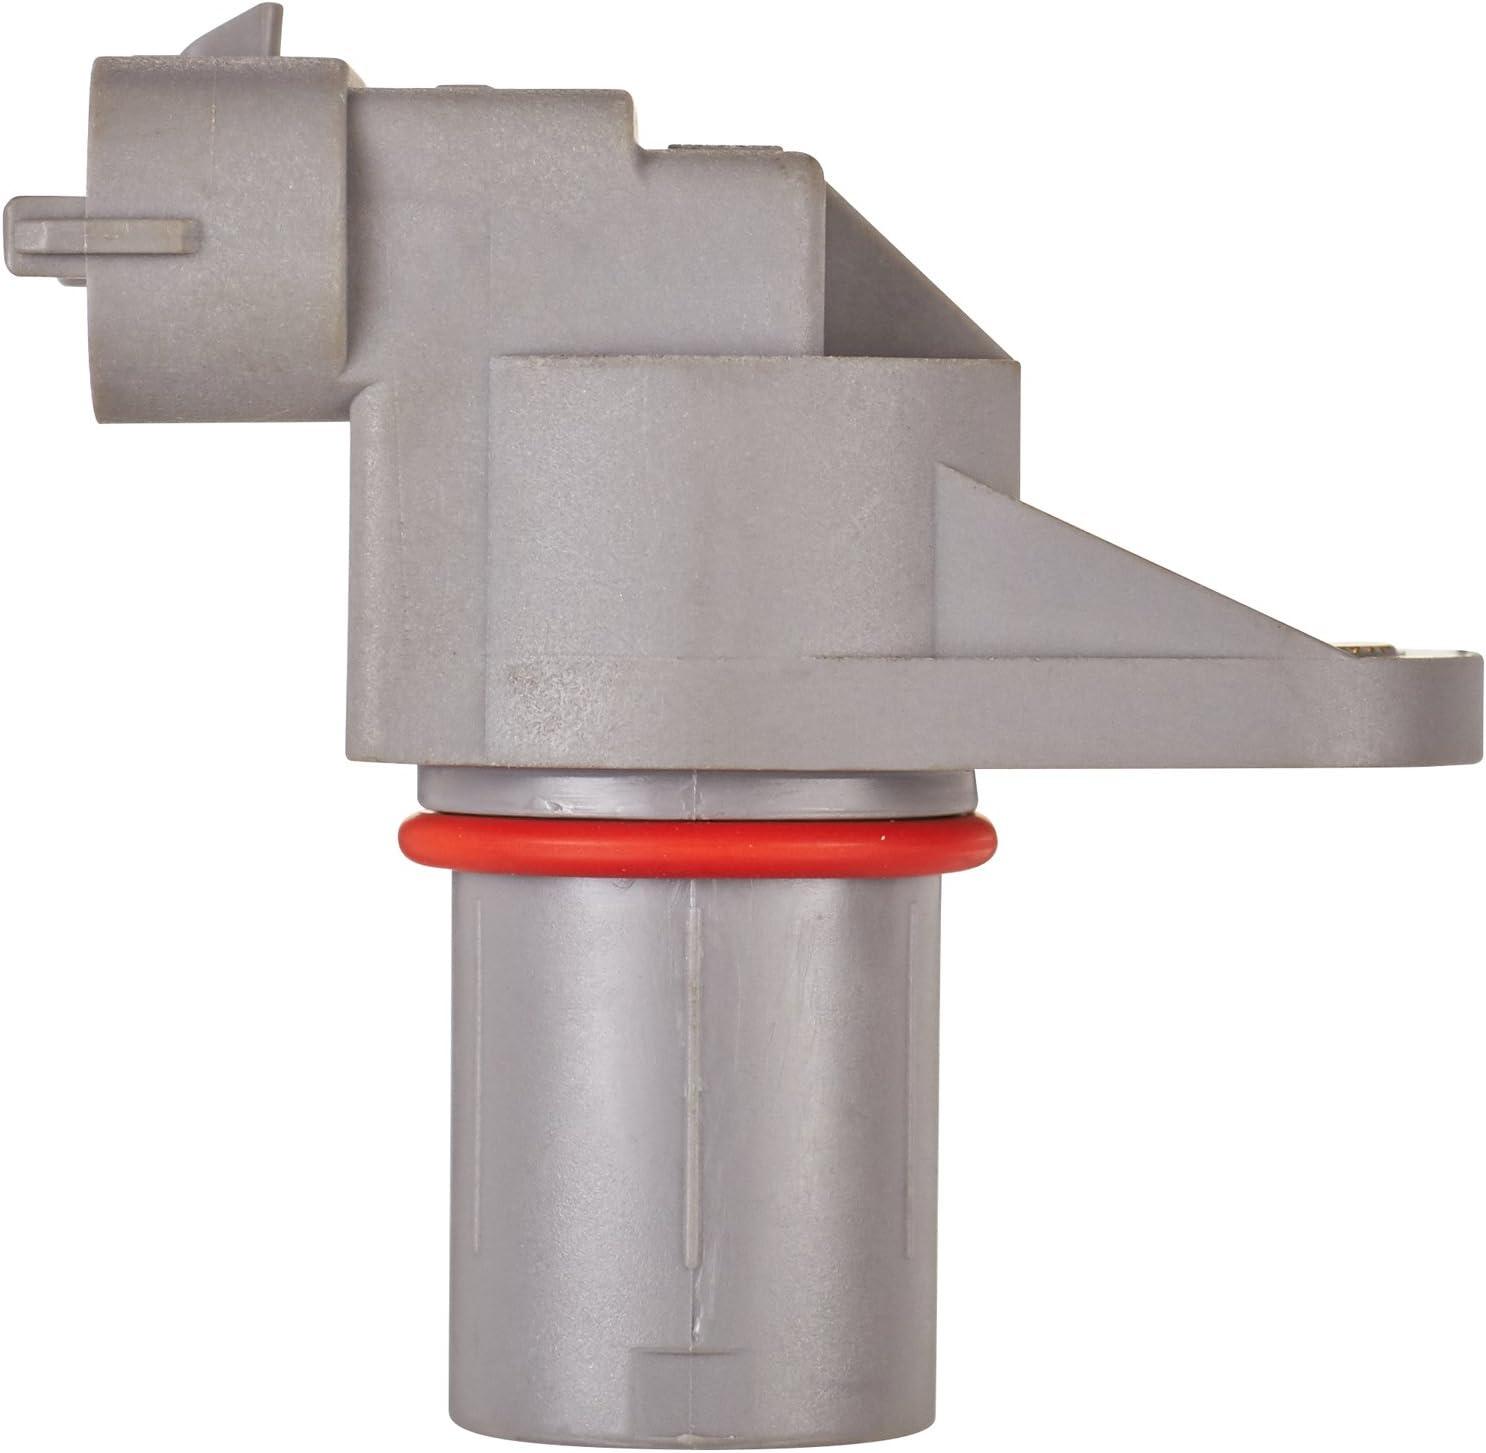 Spectra Premium S10524 Camshaft Position Sensor